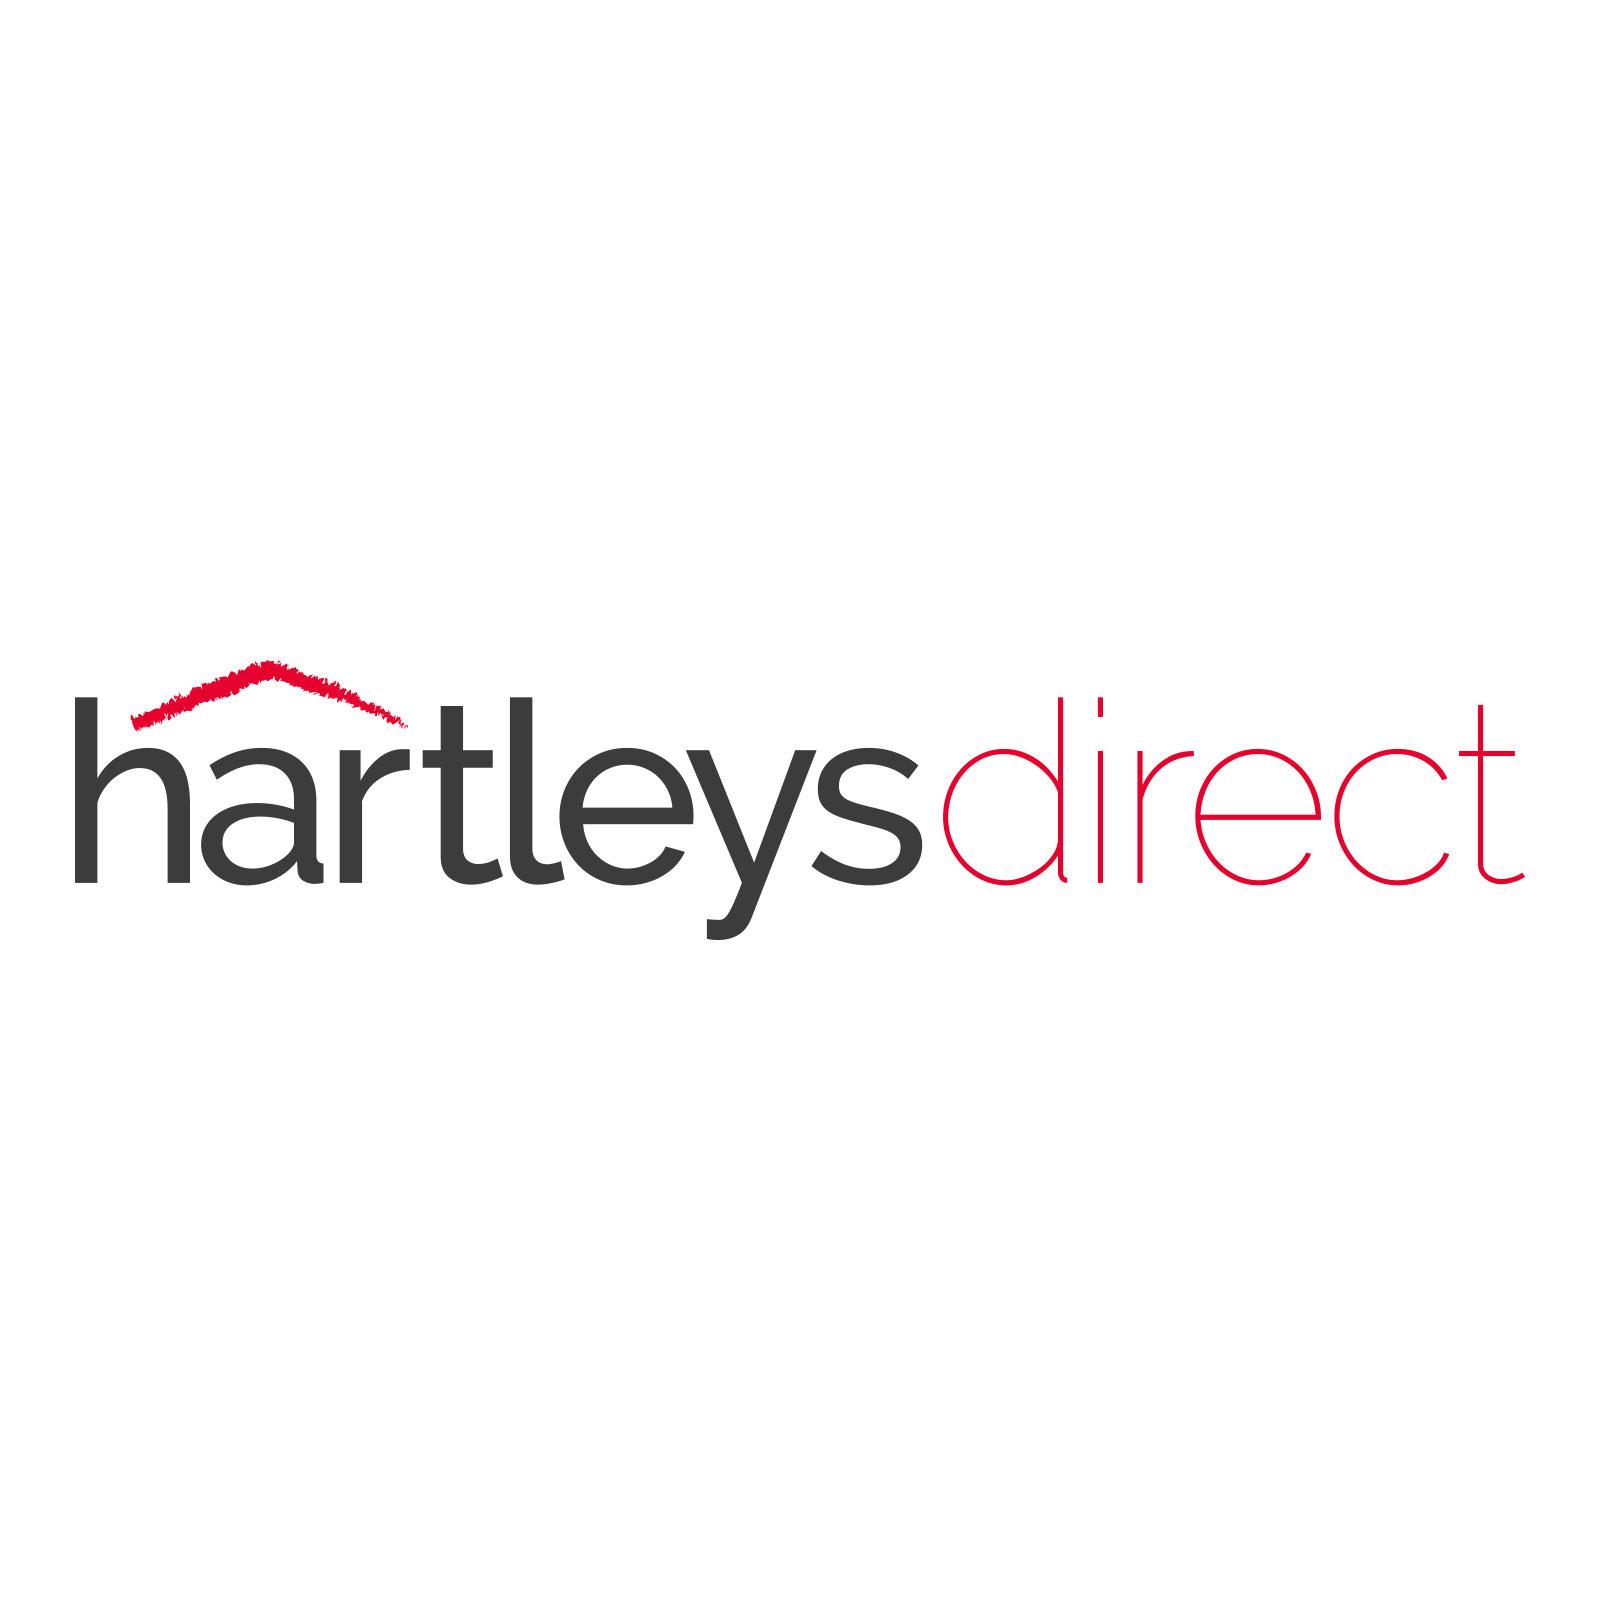 Hartleys-Black-5-Tier-Bookcase-on-White-Background.jpg